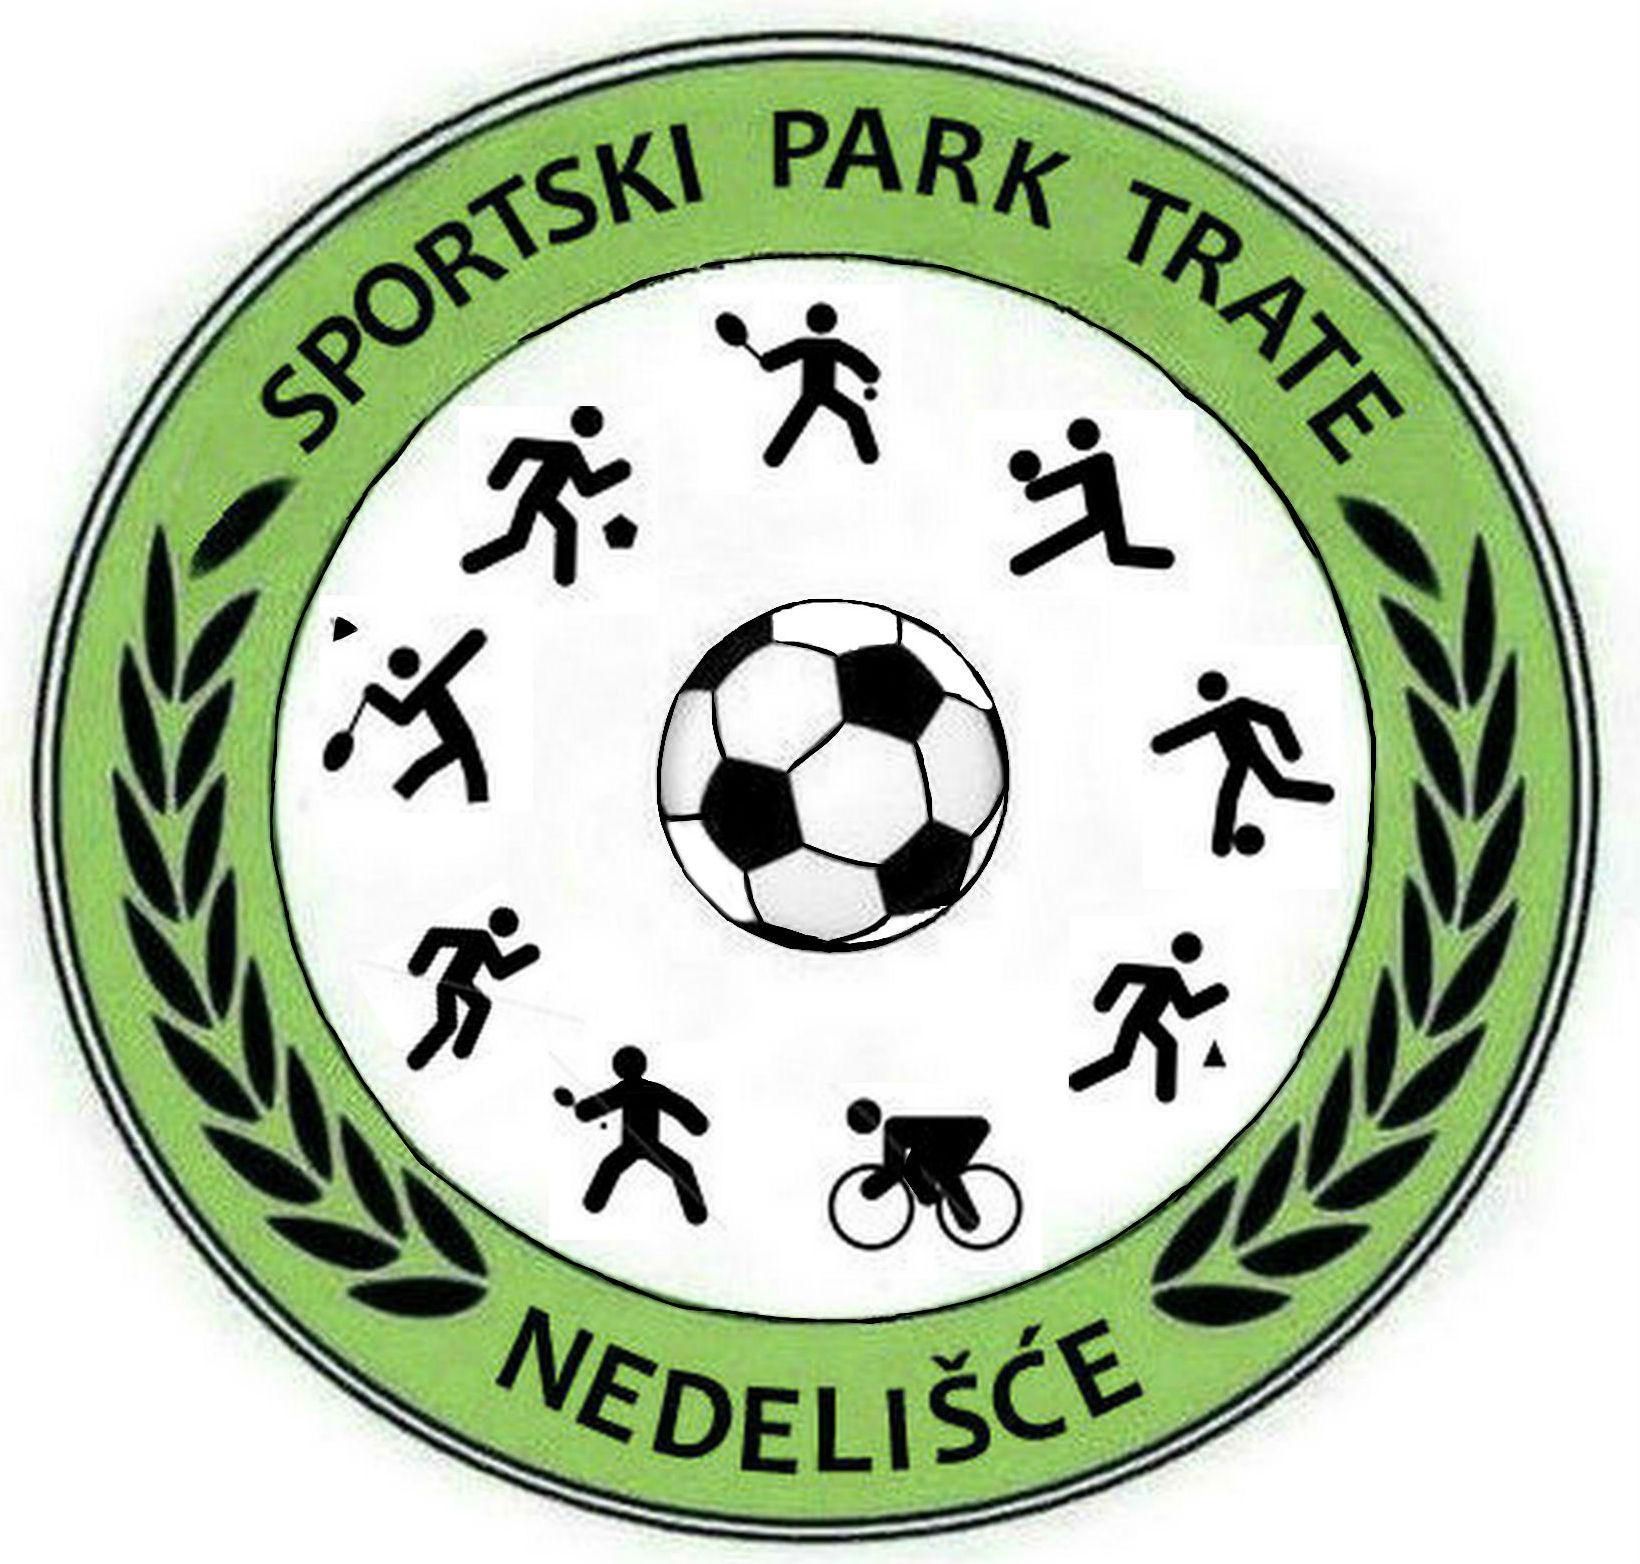 Sportski park TRATE